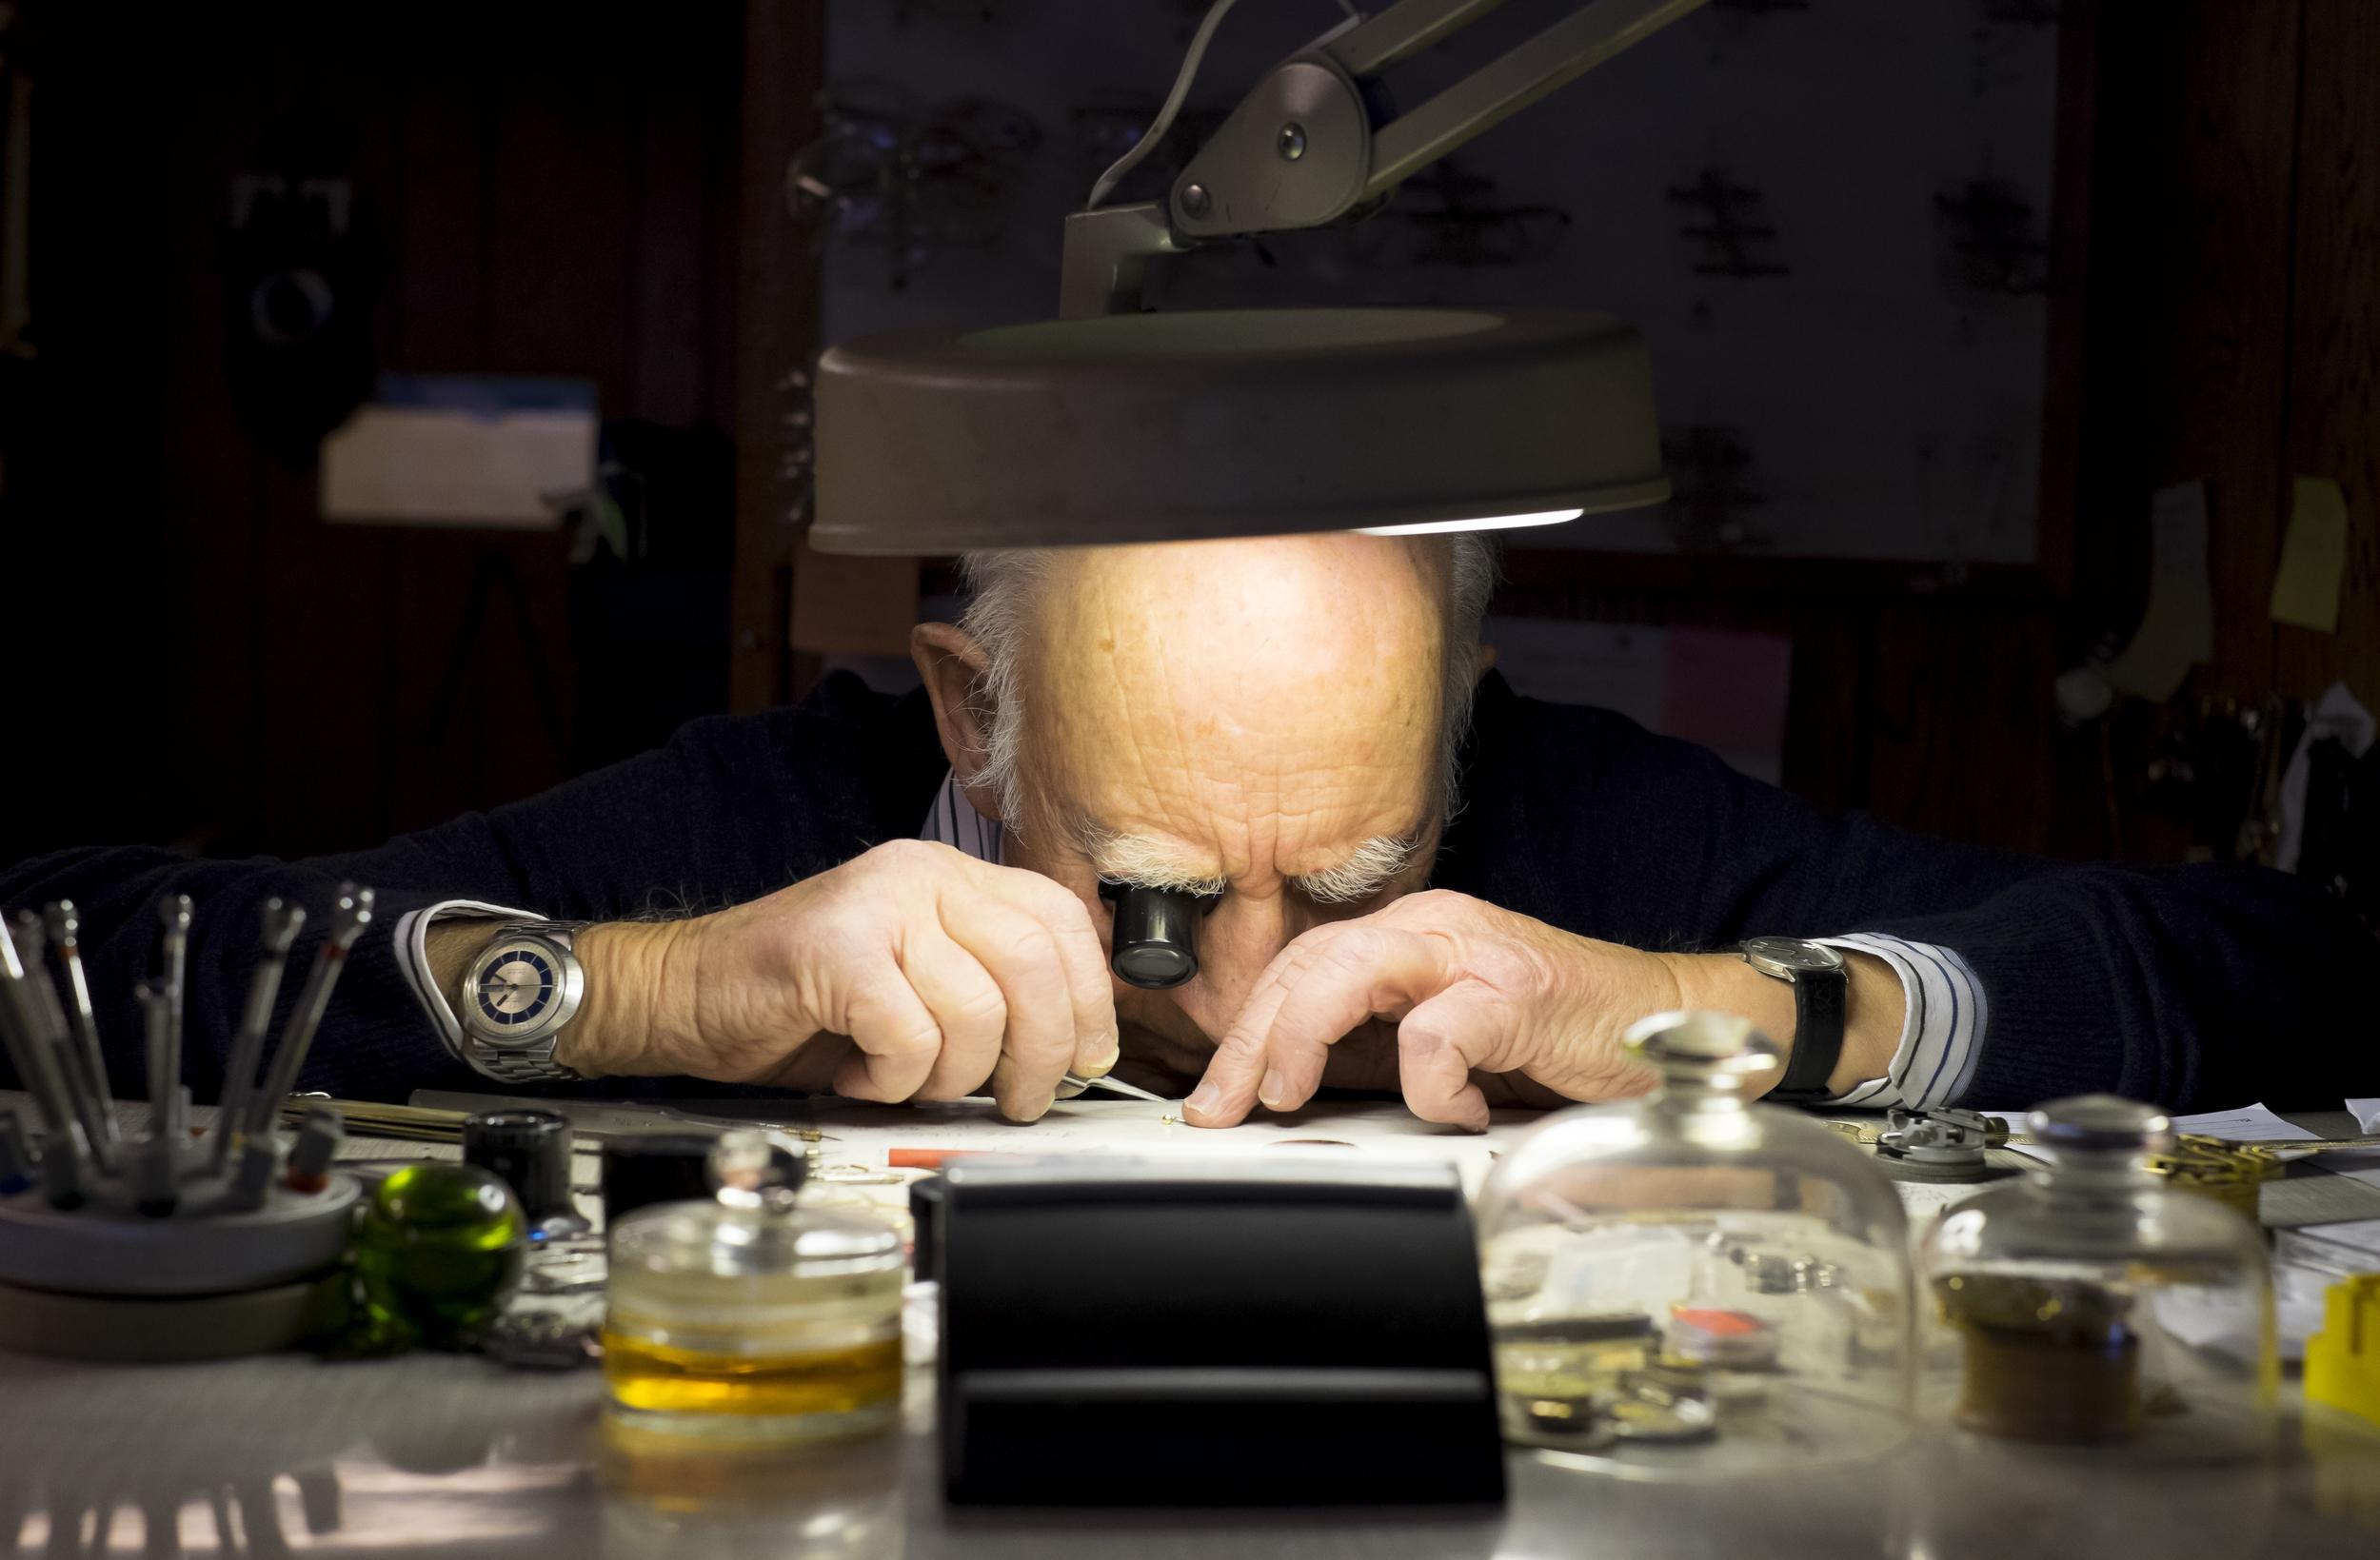 Watchmaker Thorbjørn Andersen